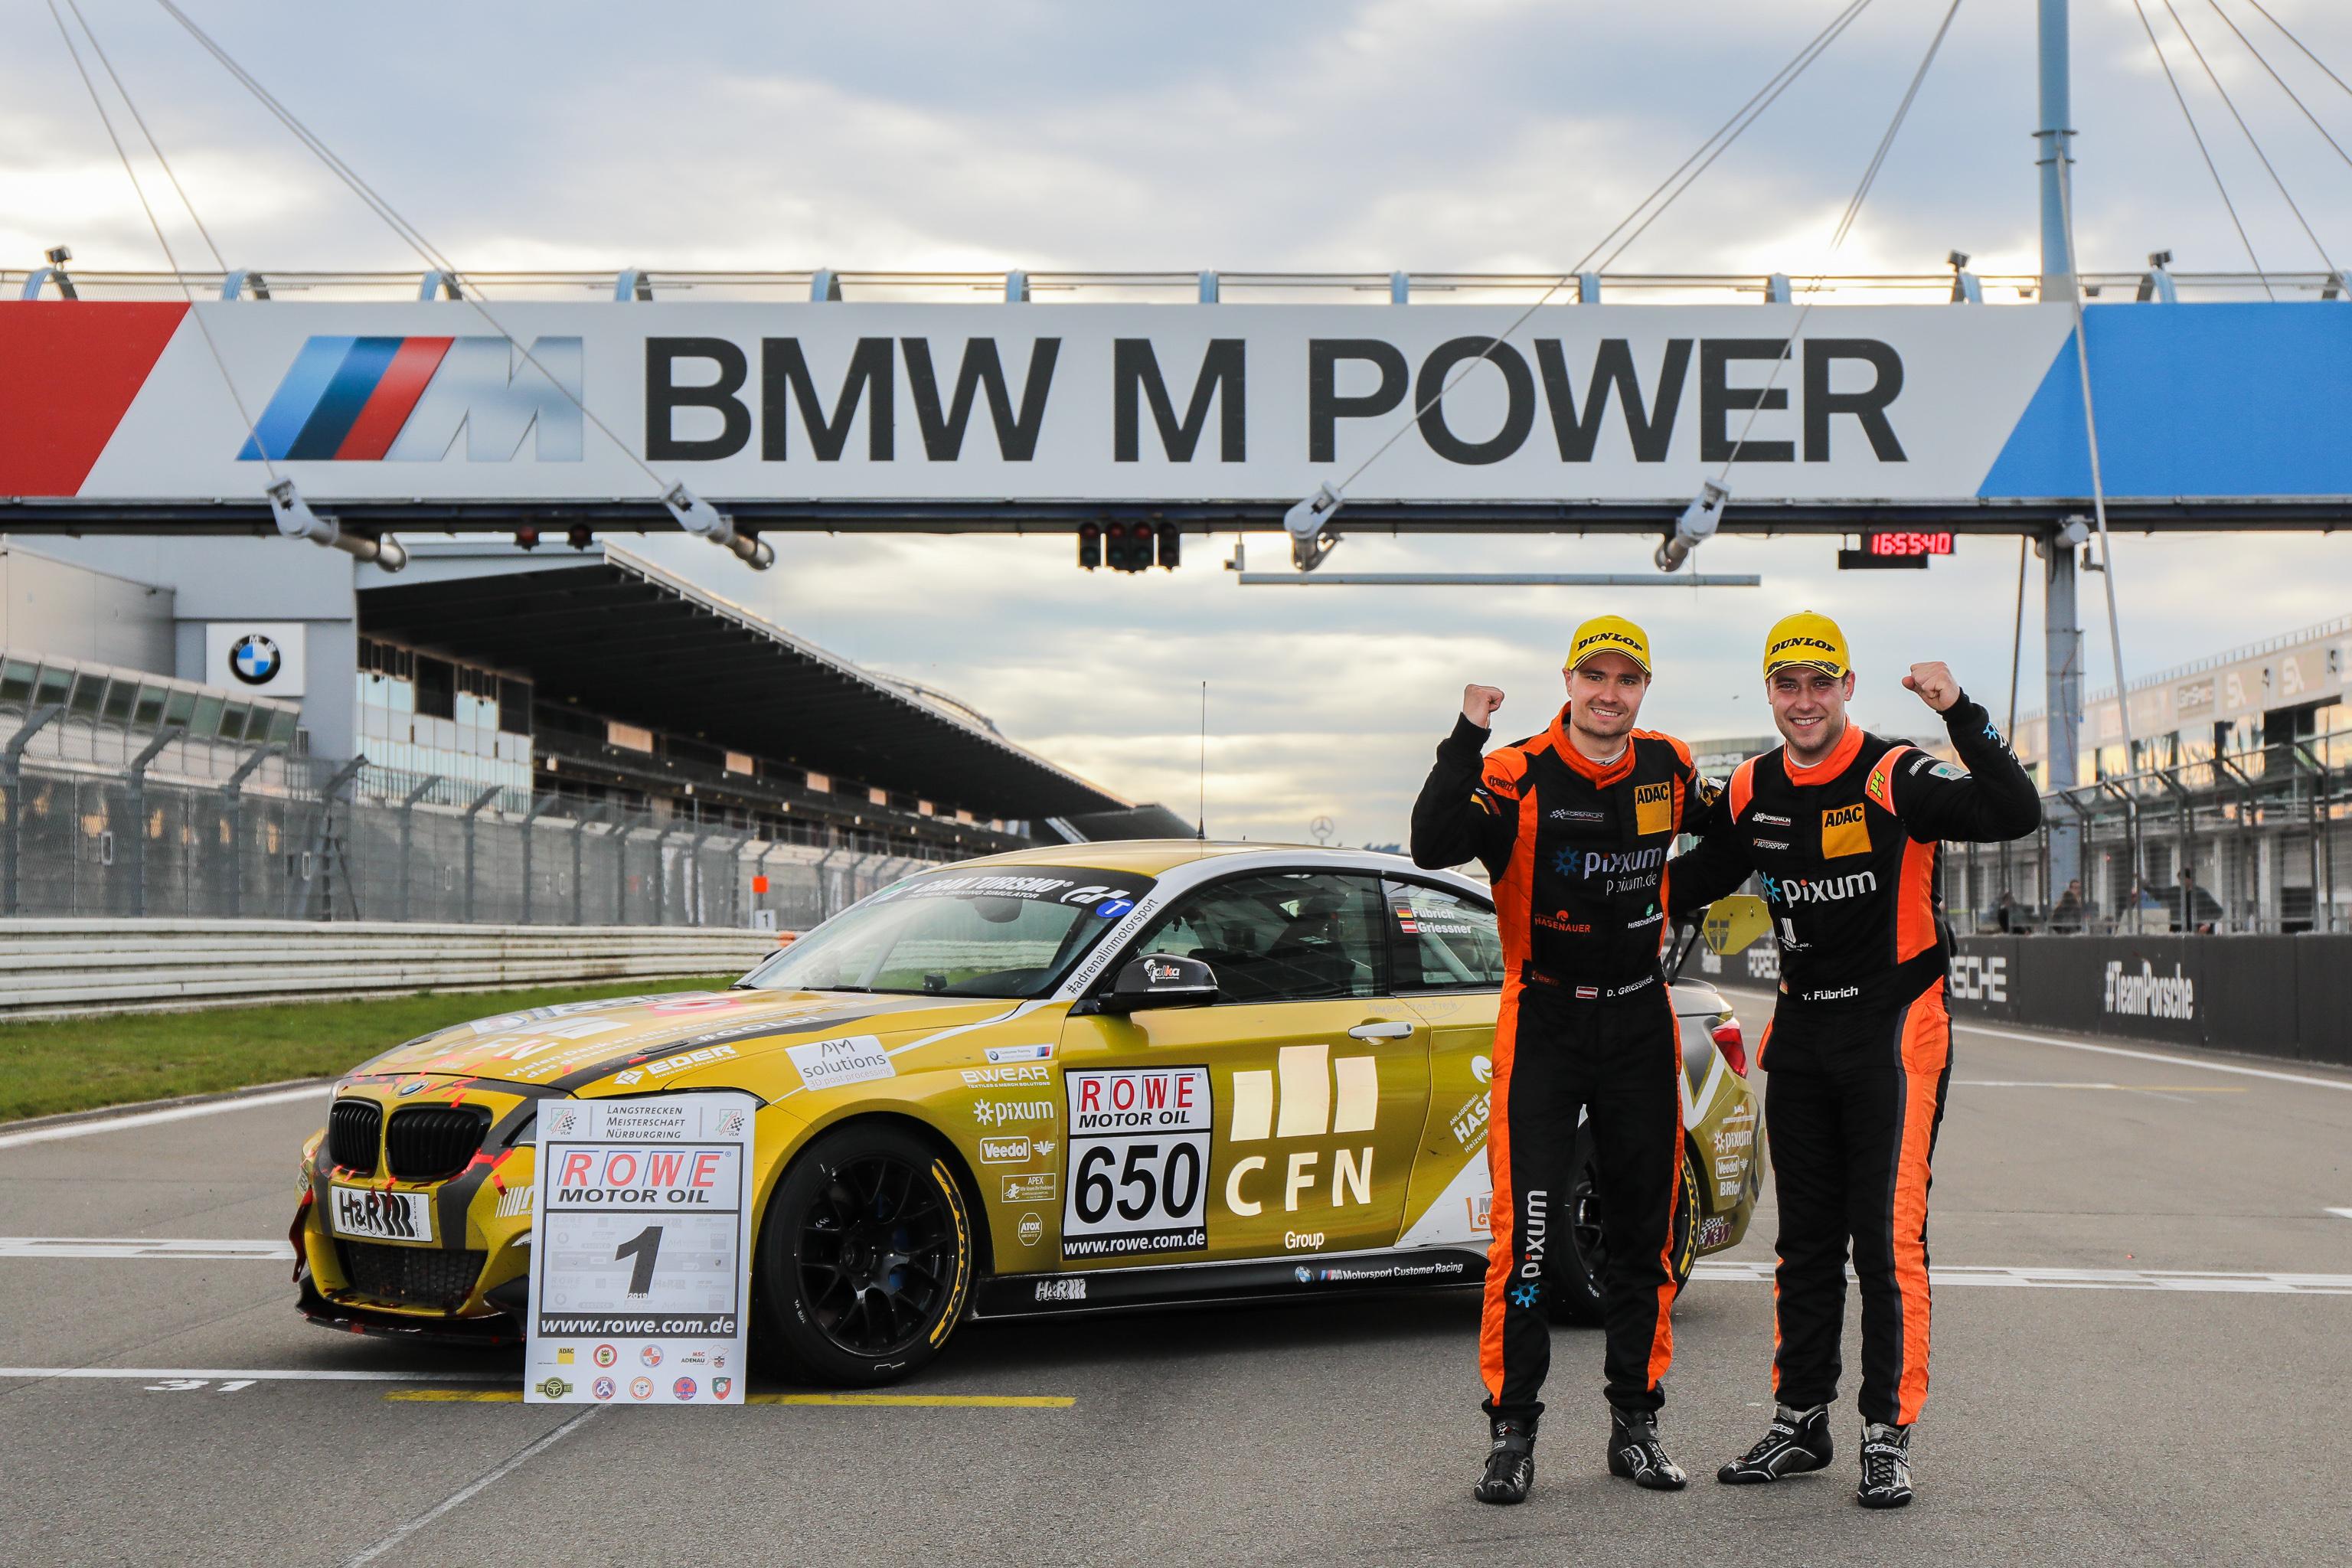 VLN Langstreckenmeisterschaft Nuerburgring 2019, 44. DMV Muensterlandpokal (2019-10-26): #650 - David Griessner, Yannick Fuebrich (BMW M240i Racing Cup) - CUP5